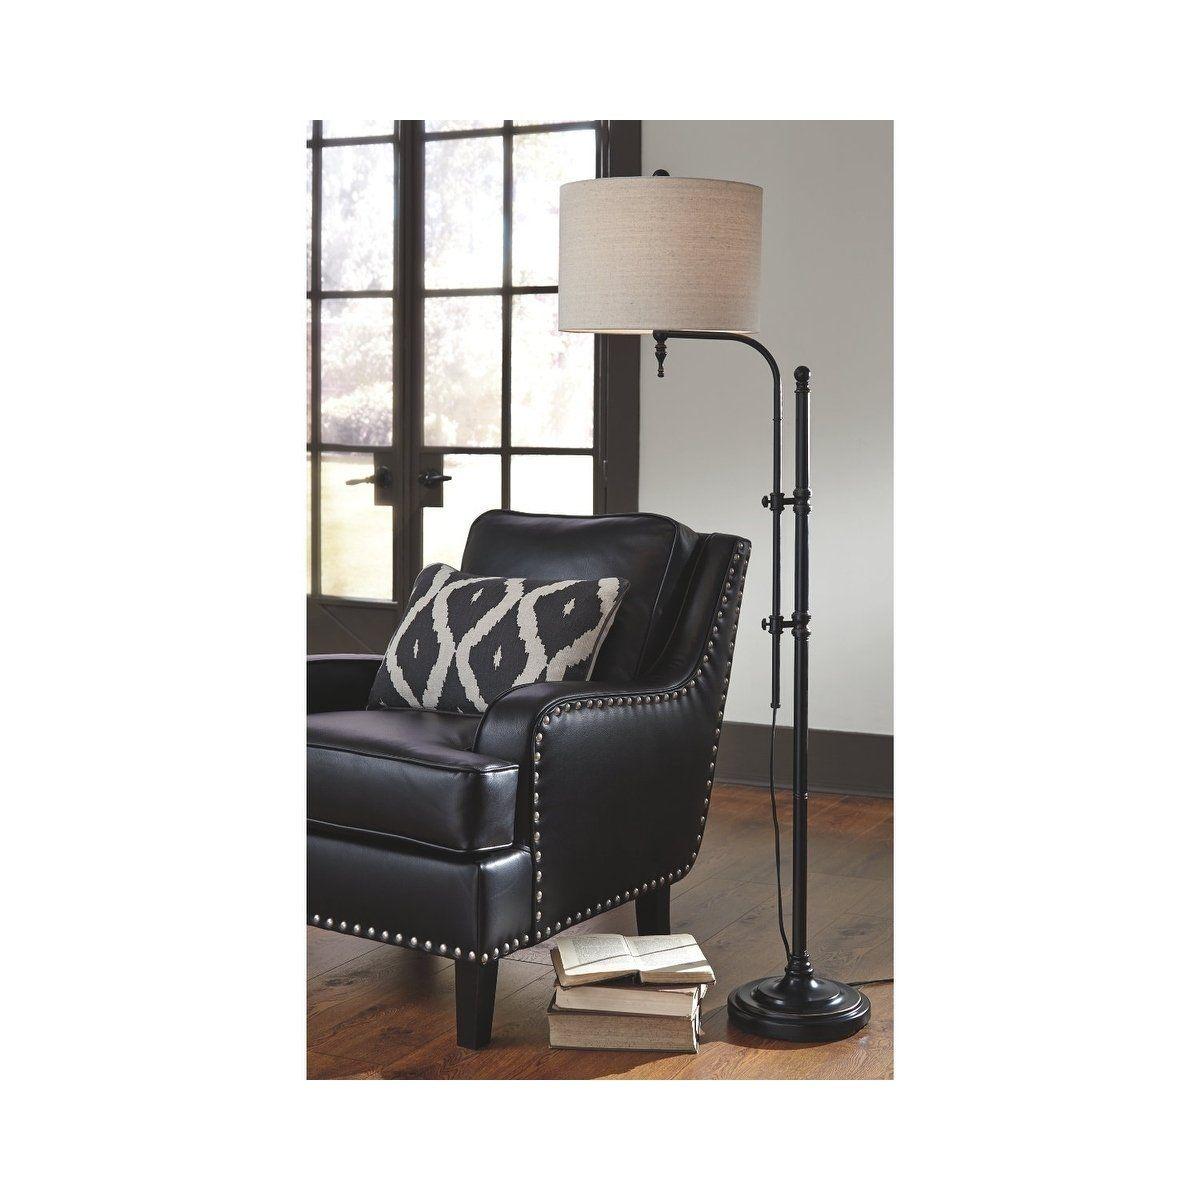 Anemoon Black 65 InchFloor Lamp, Signature Design by